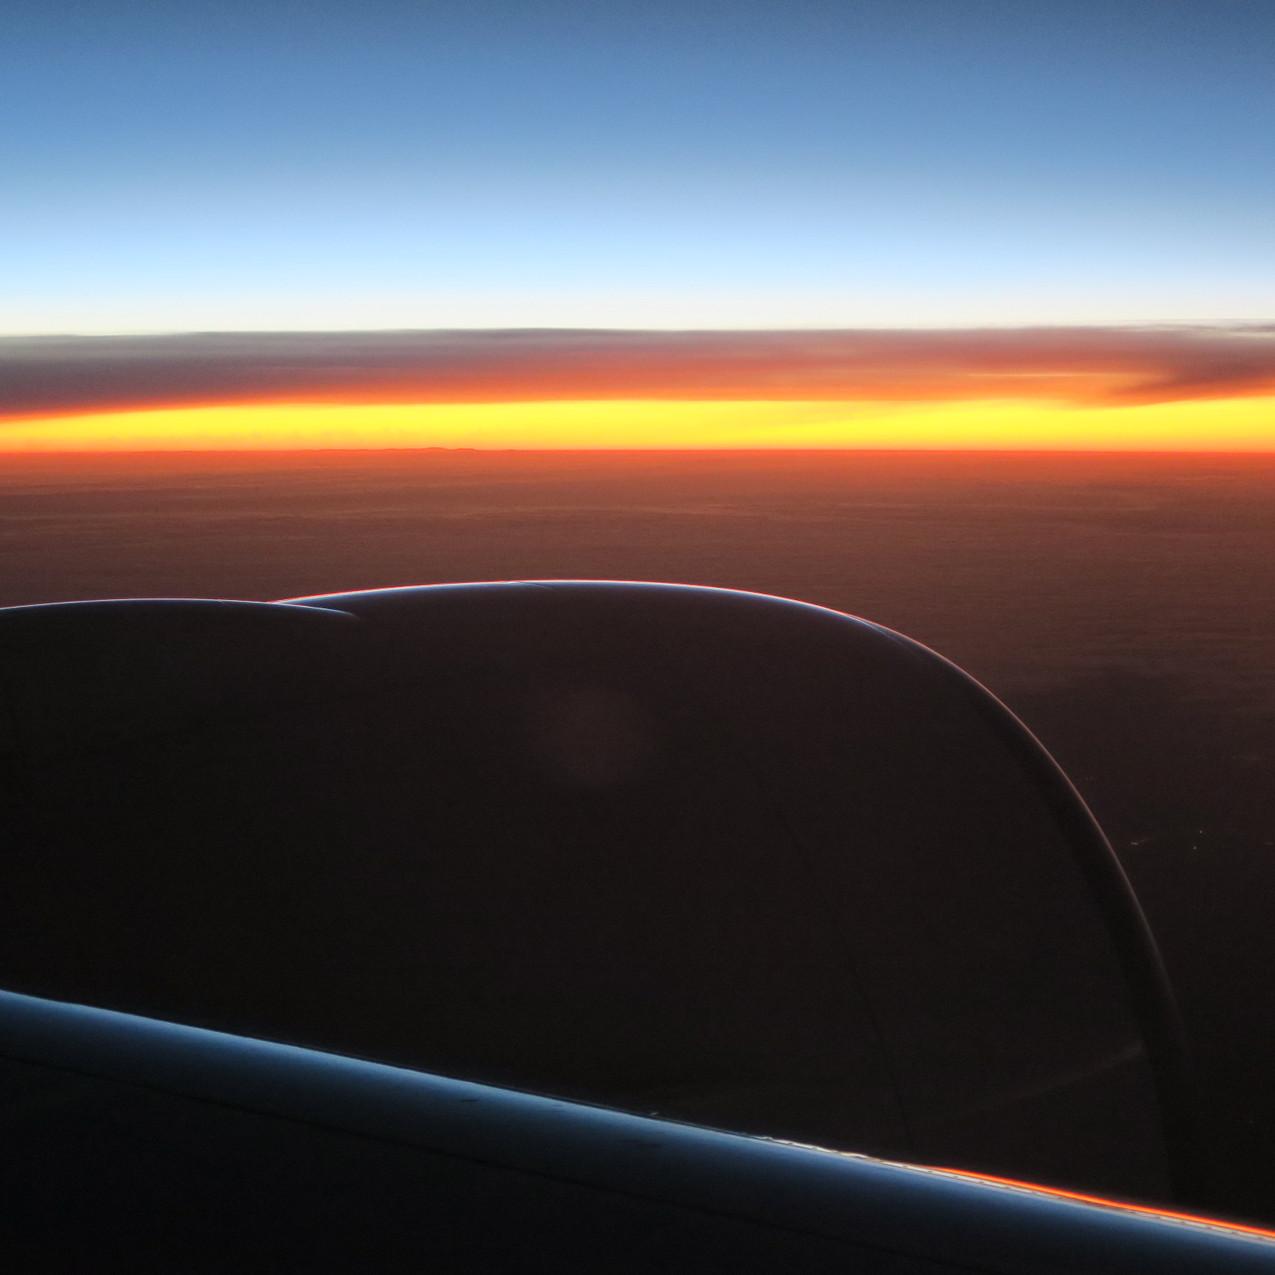 the sun will follow us wherever we g